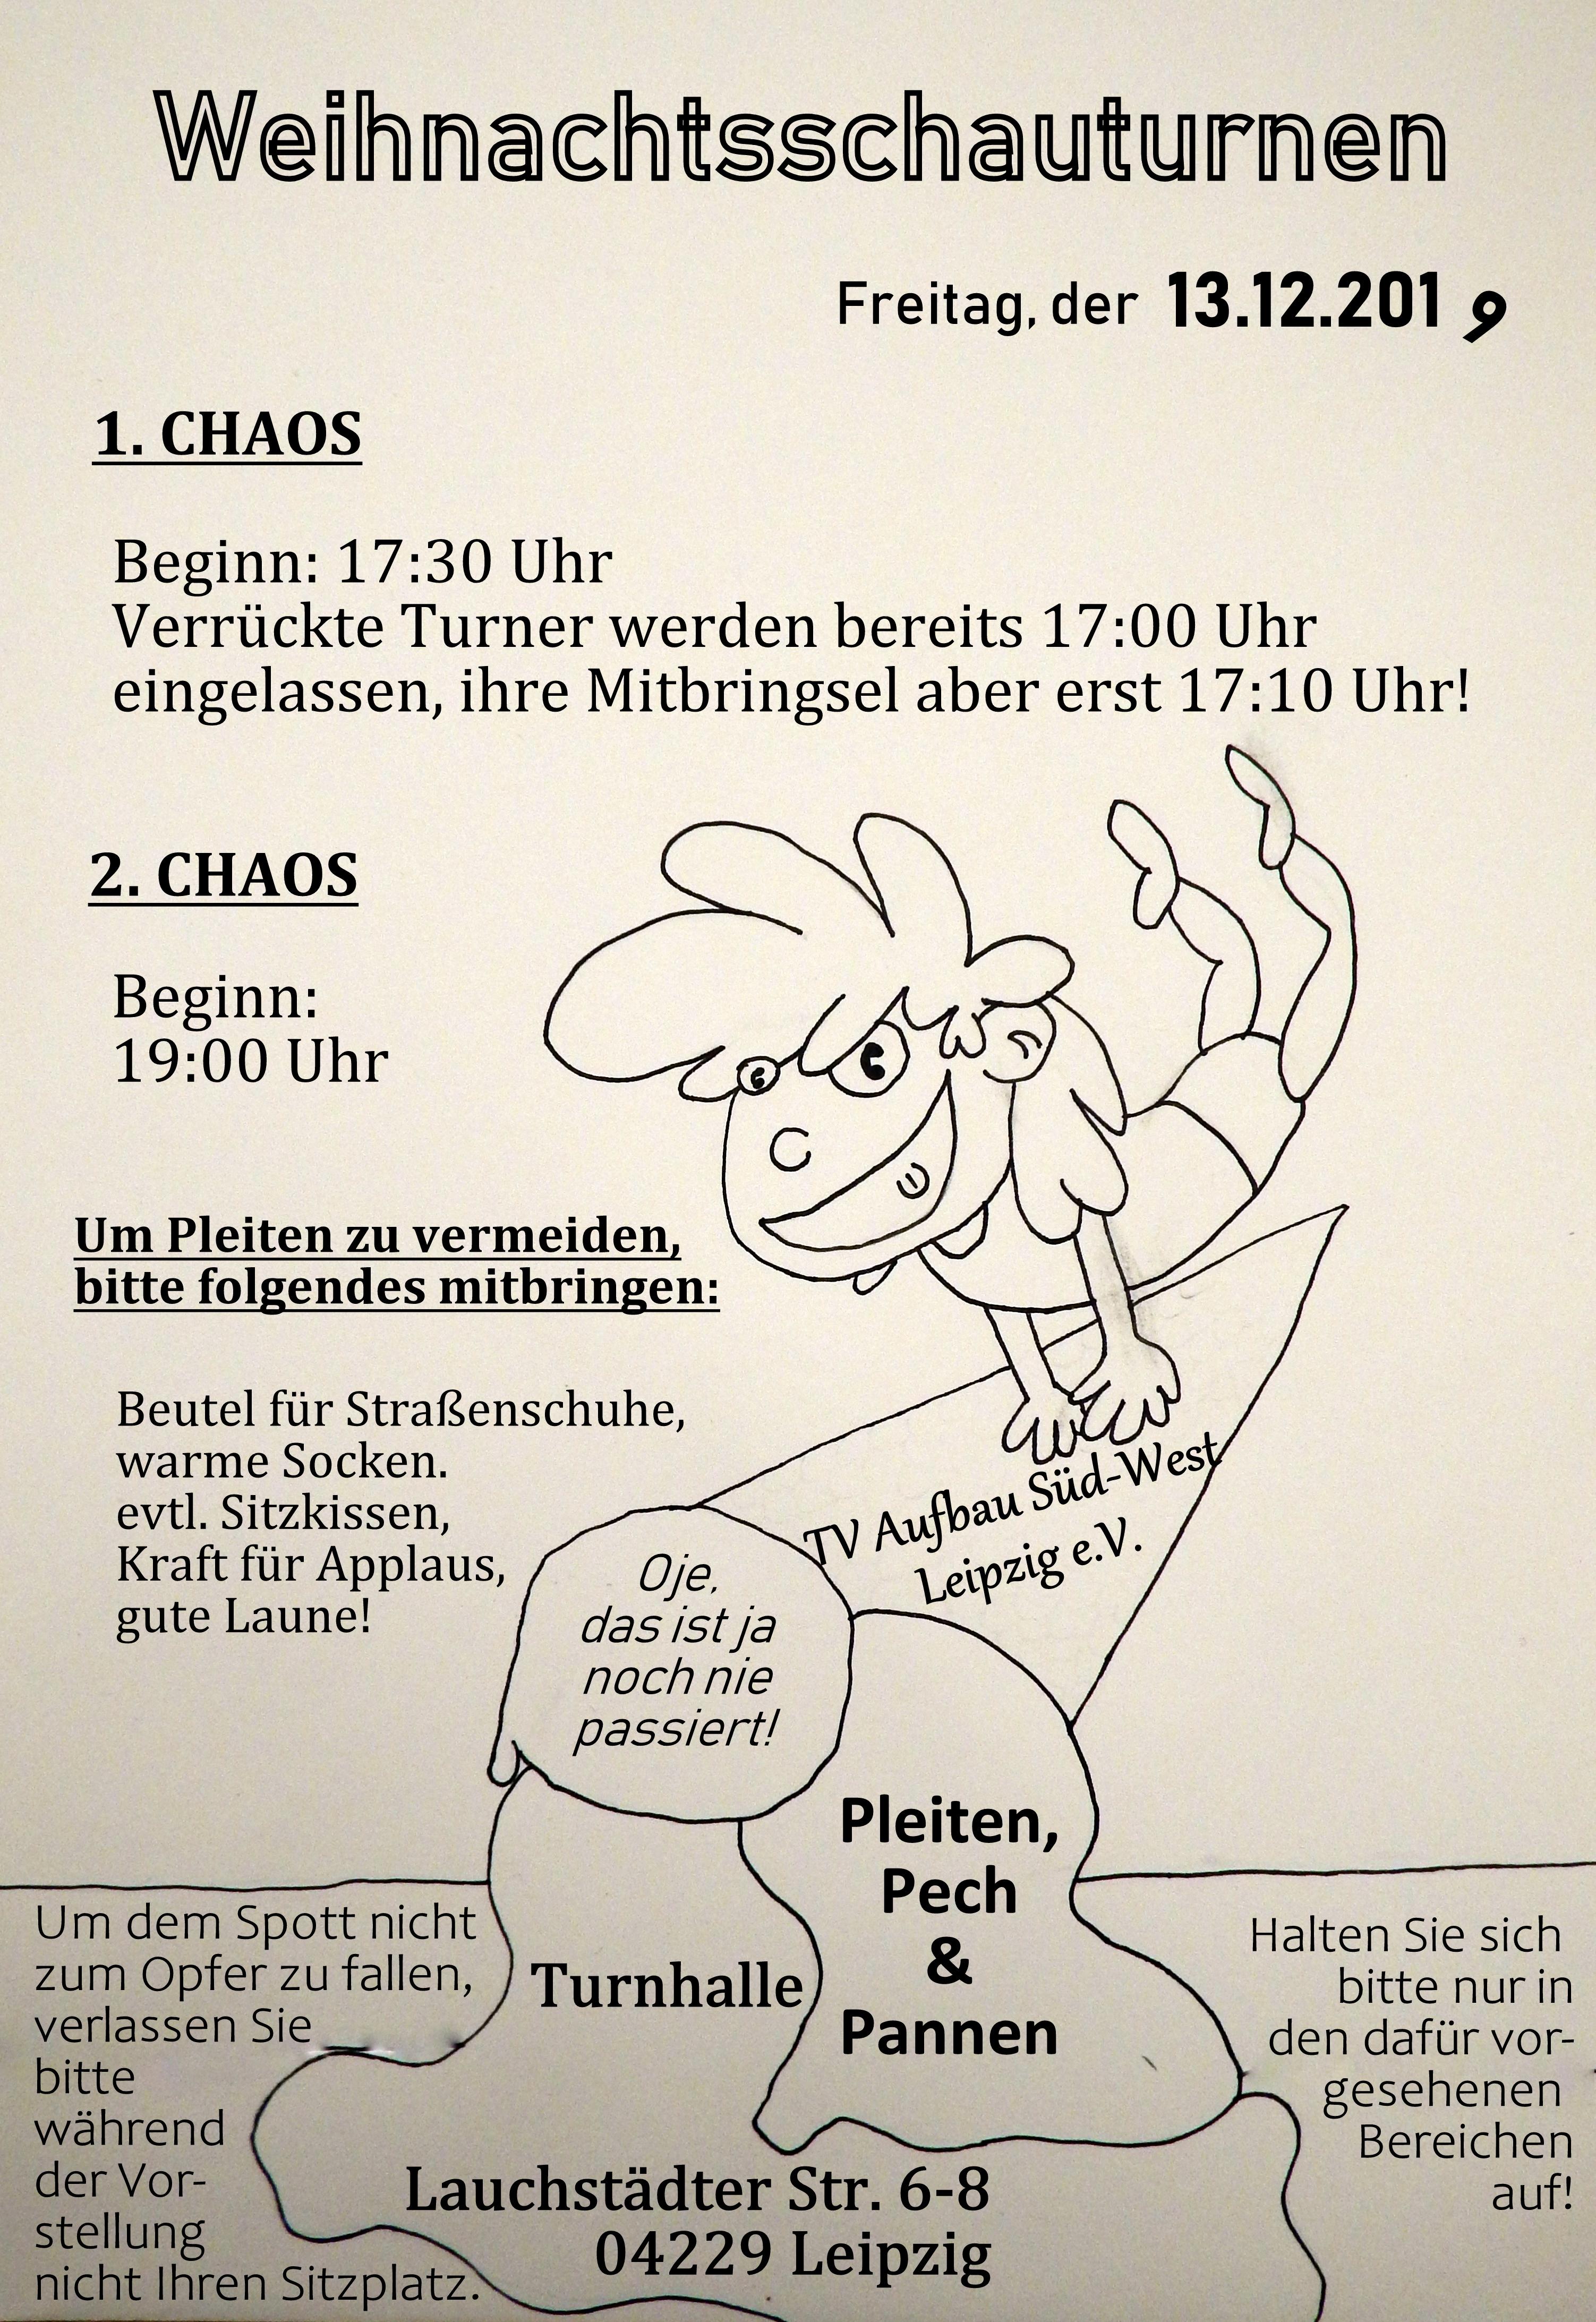 https://asw-leipzig.de/wp-content/uploads/2019/11/WST.pdf